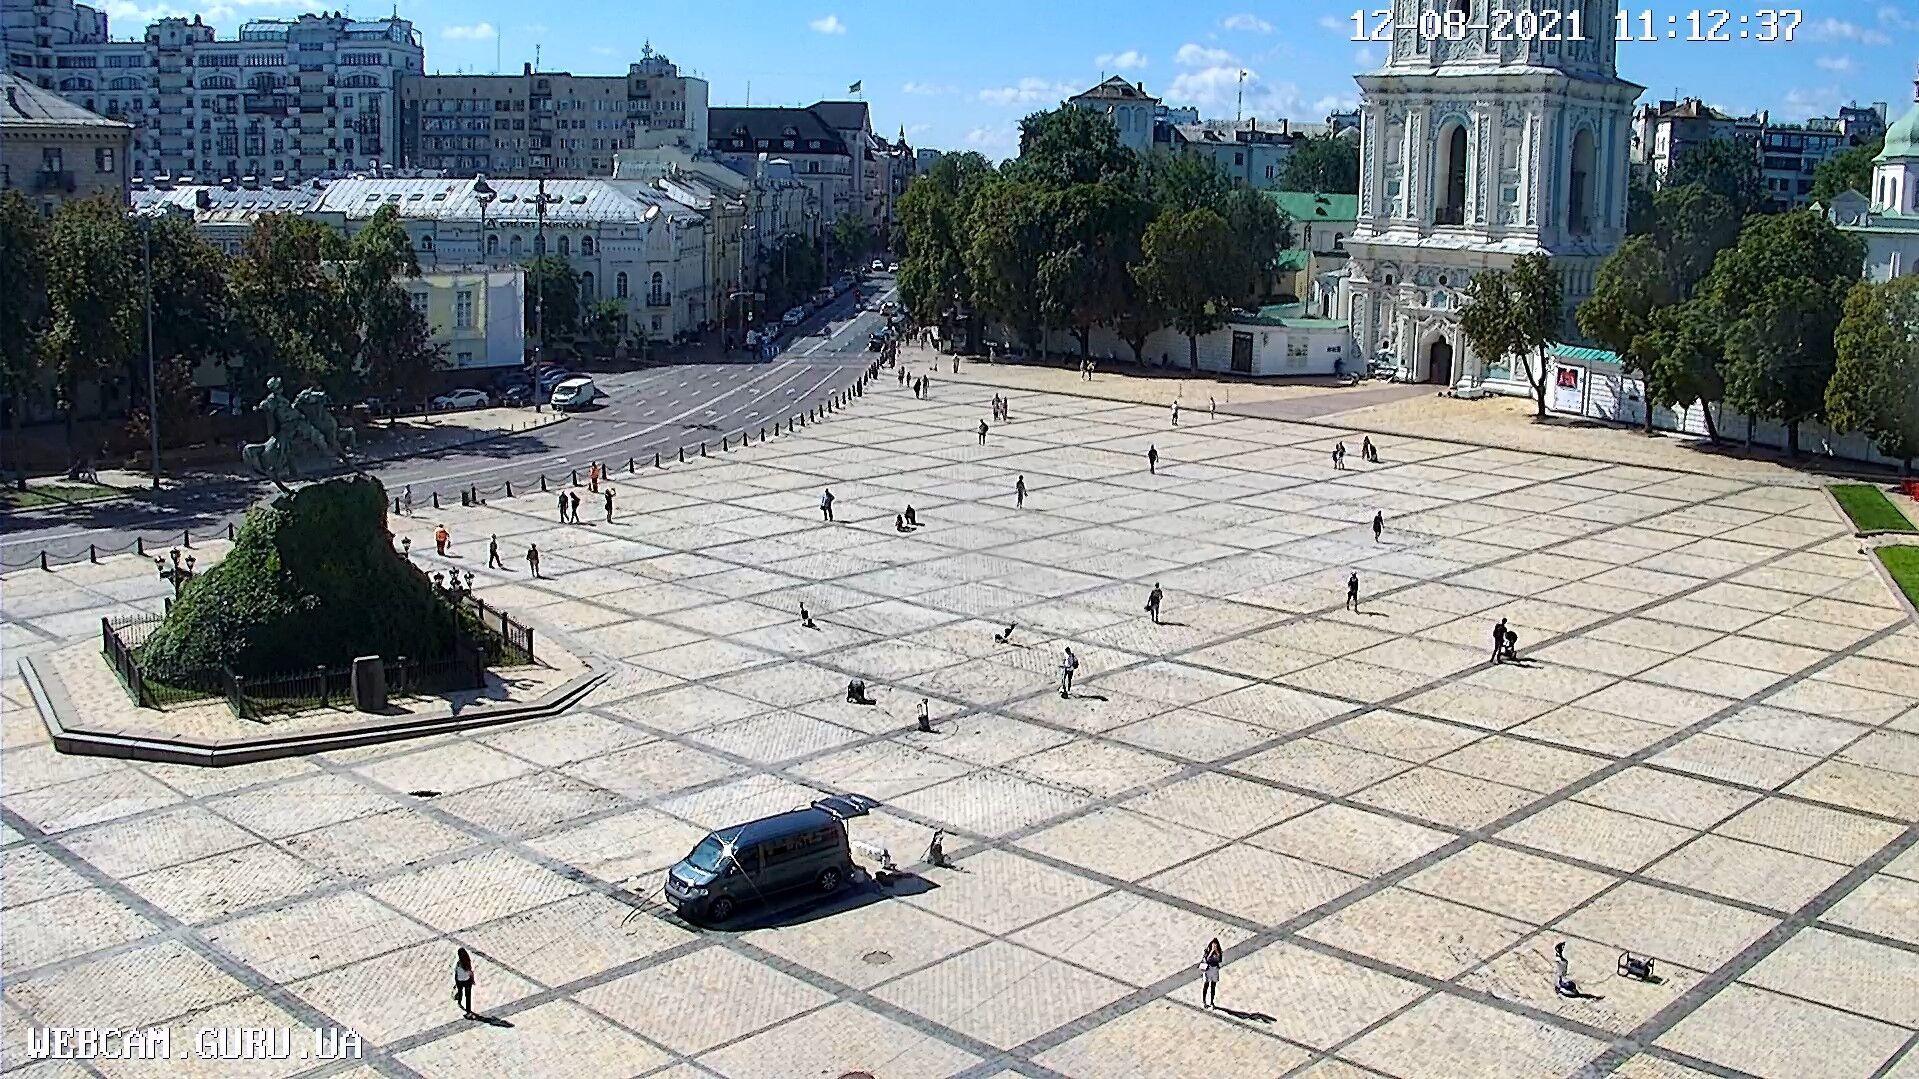 Уборка площади практически закончилась.